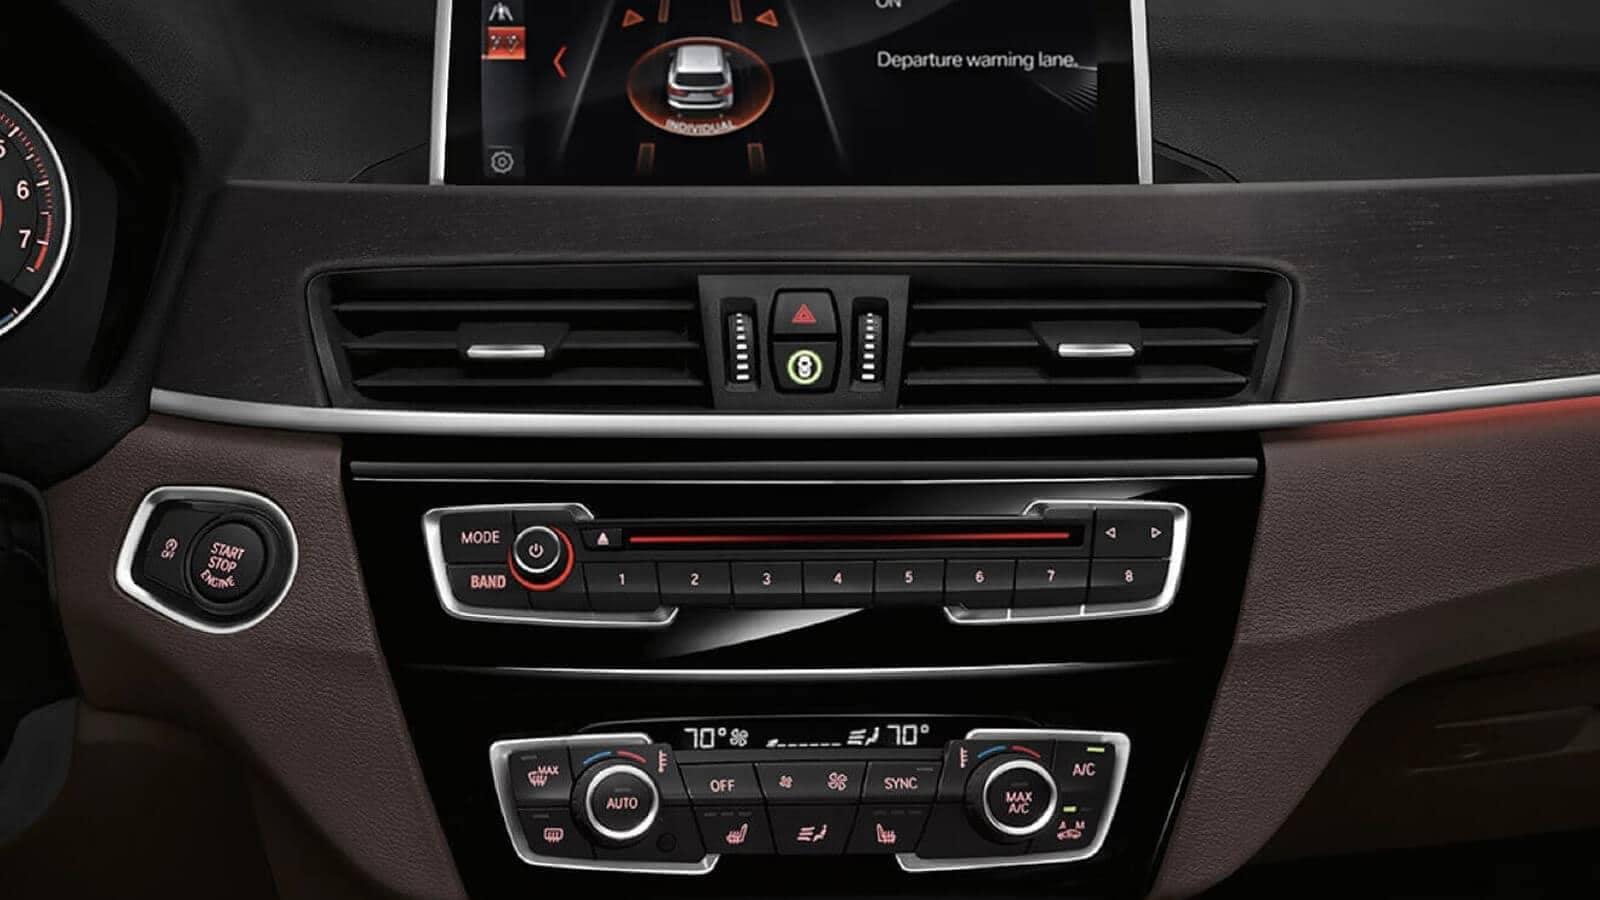 2019 BMW X1 technology